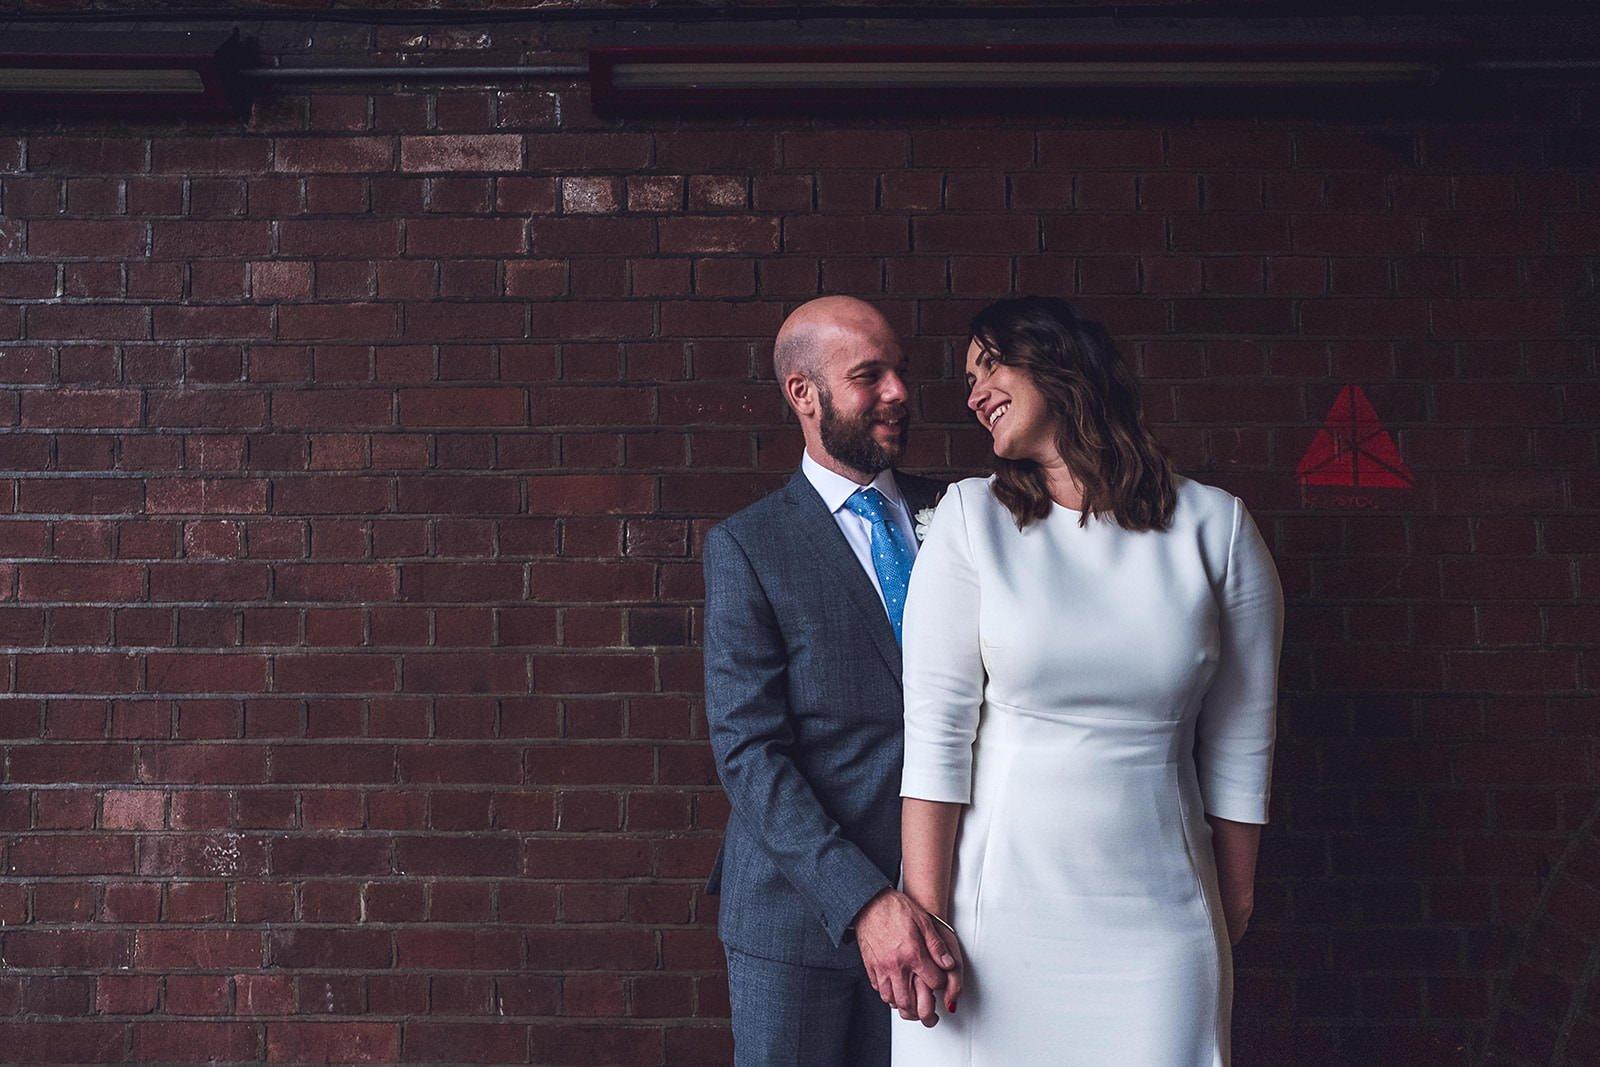 Bride and groom london elopement